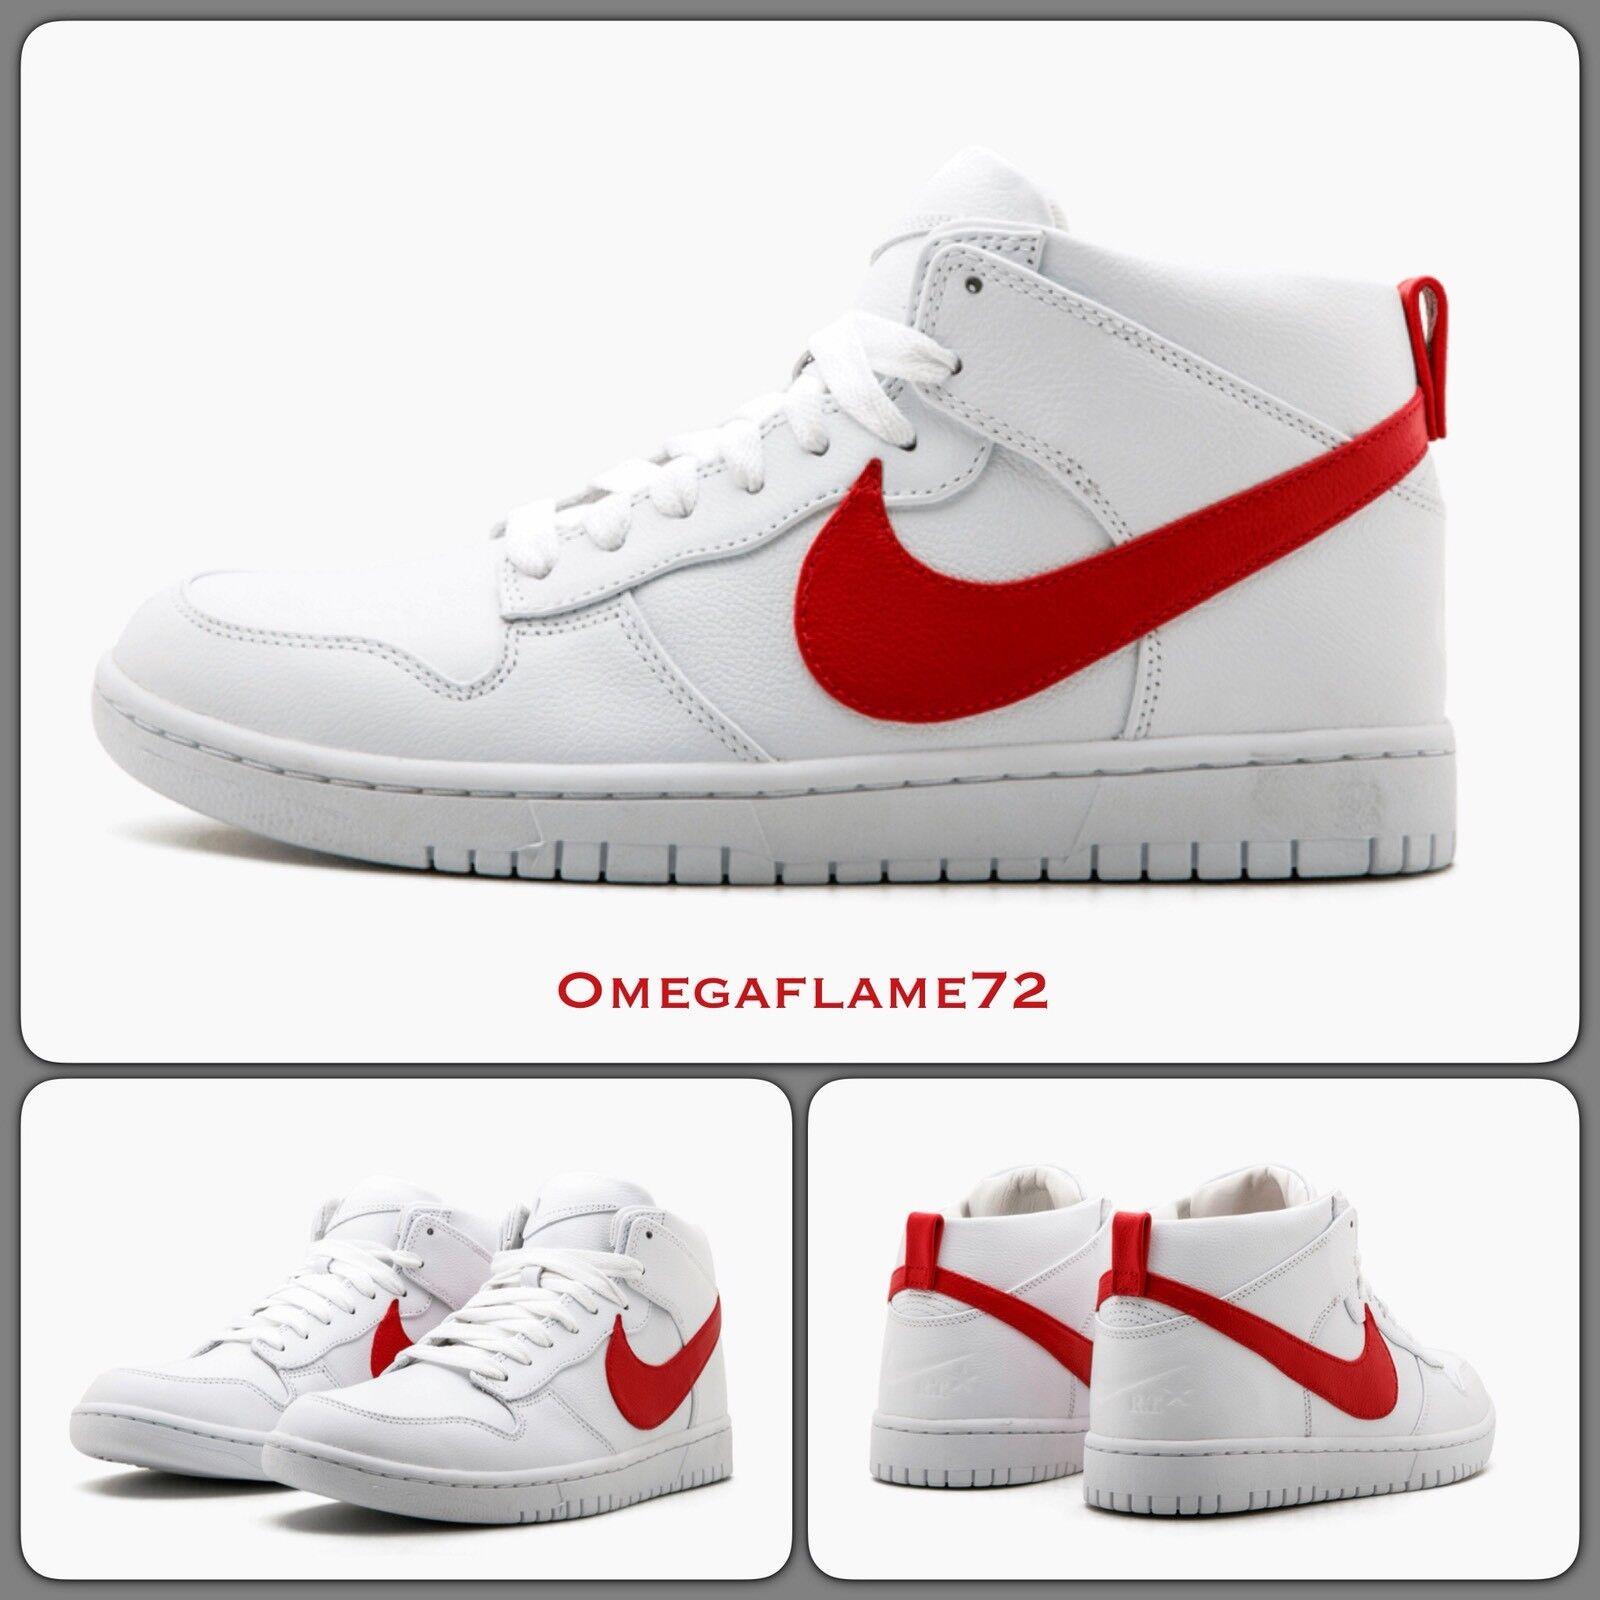 Nike Dunk Lux Chukka RT 910088-100,10.5, EU 45.5, US 11.5, Riccardo Tisci